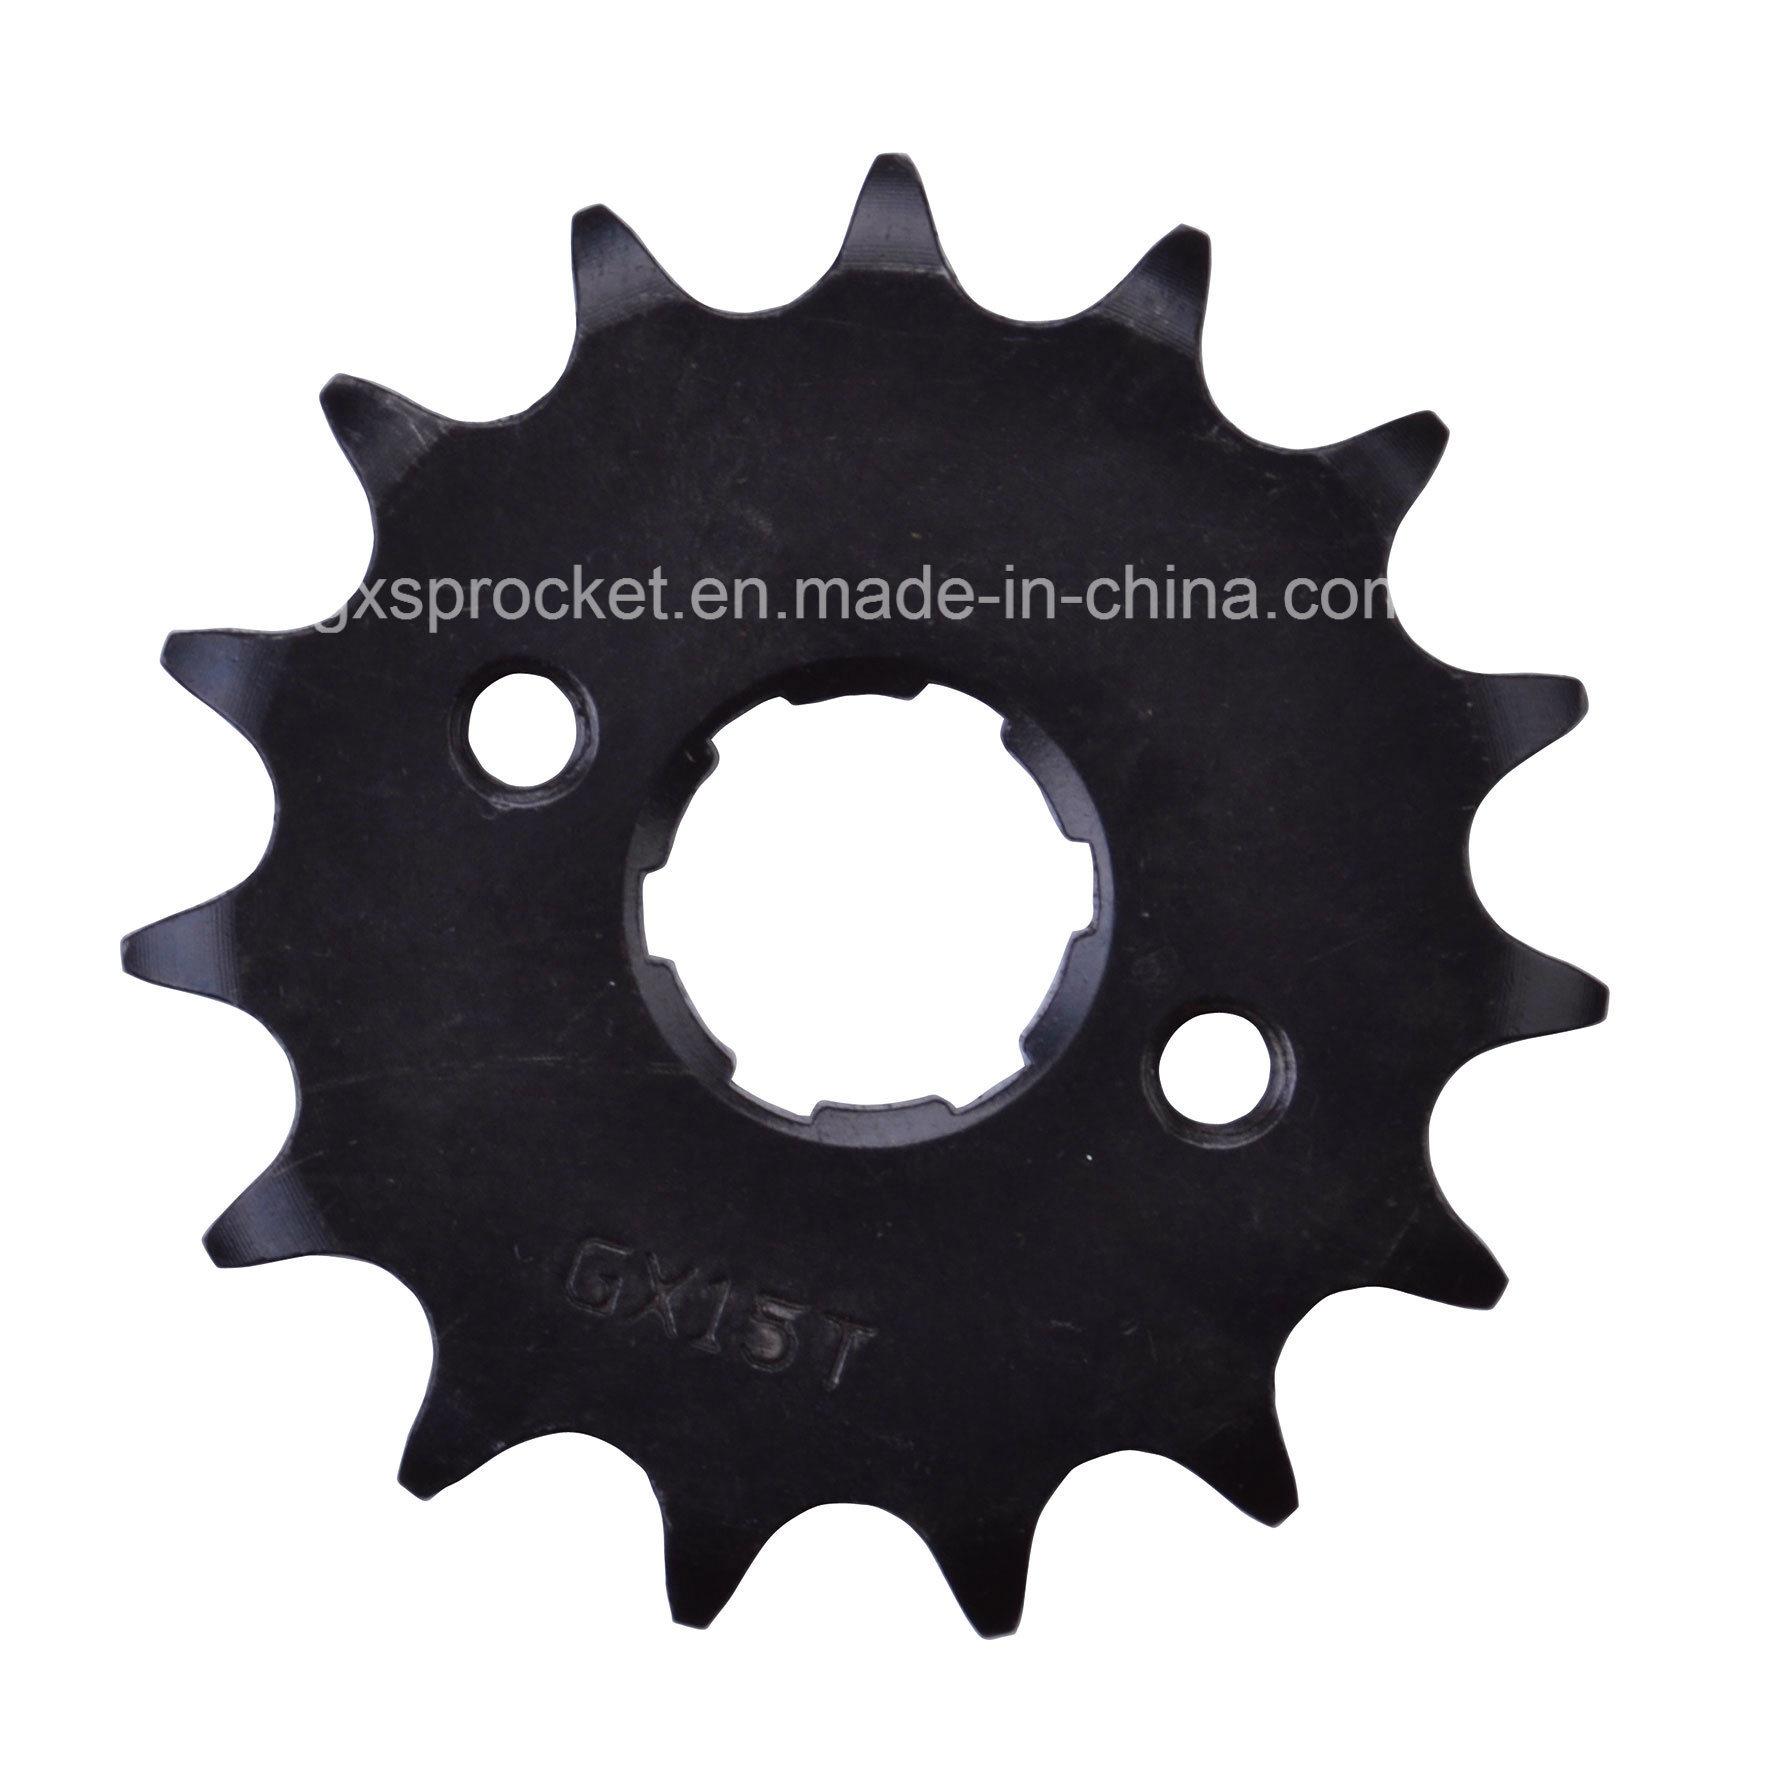 hight resolution of china sprocket front for honda cb125 cg125 suzuki cg125 china motorcycle sprocket front sprocket